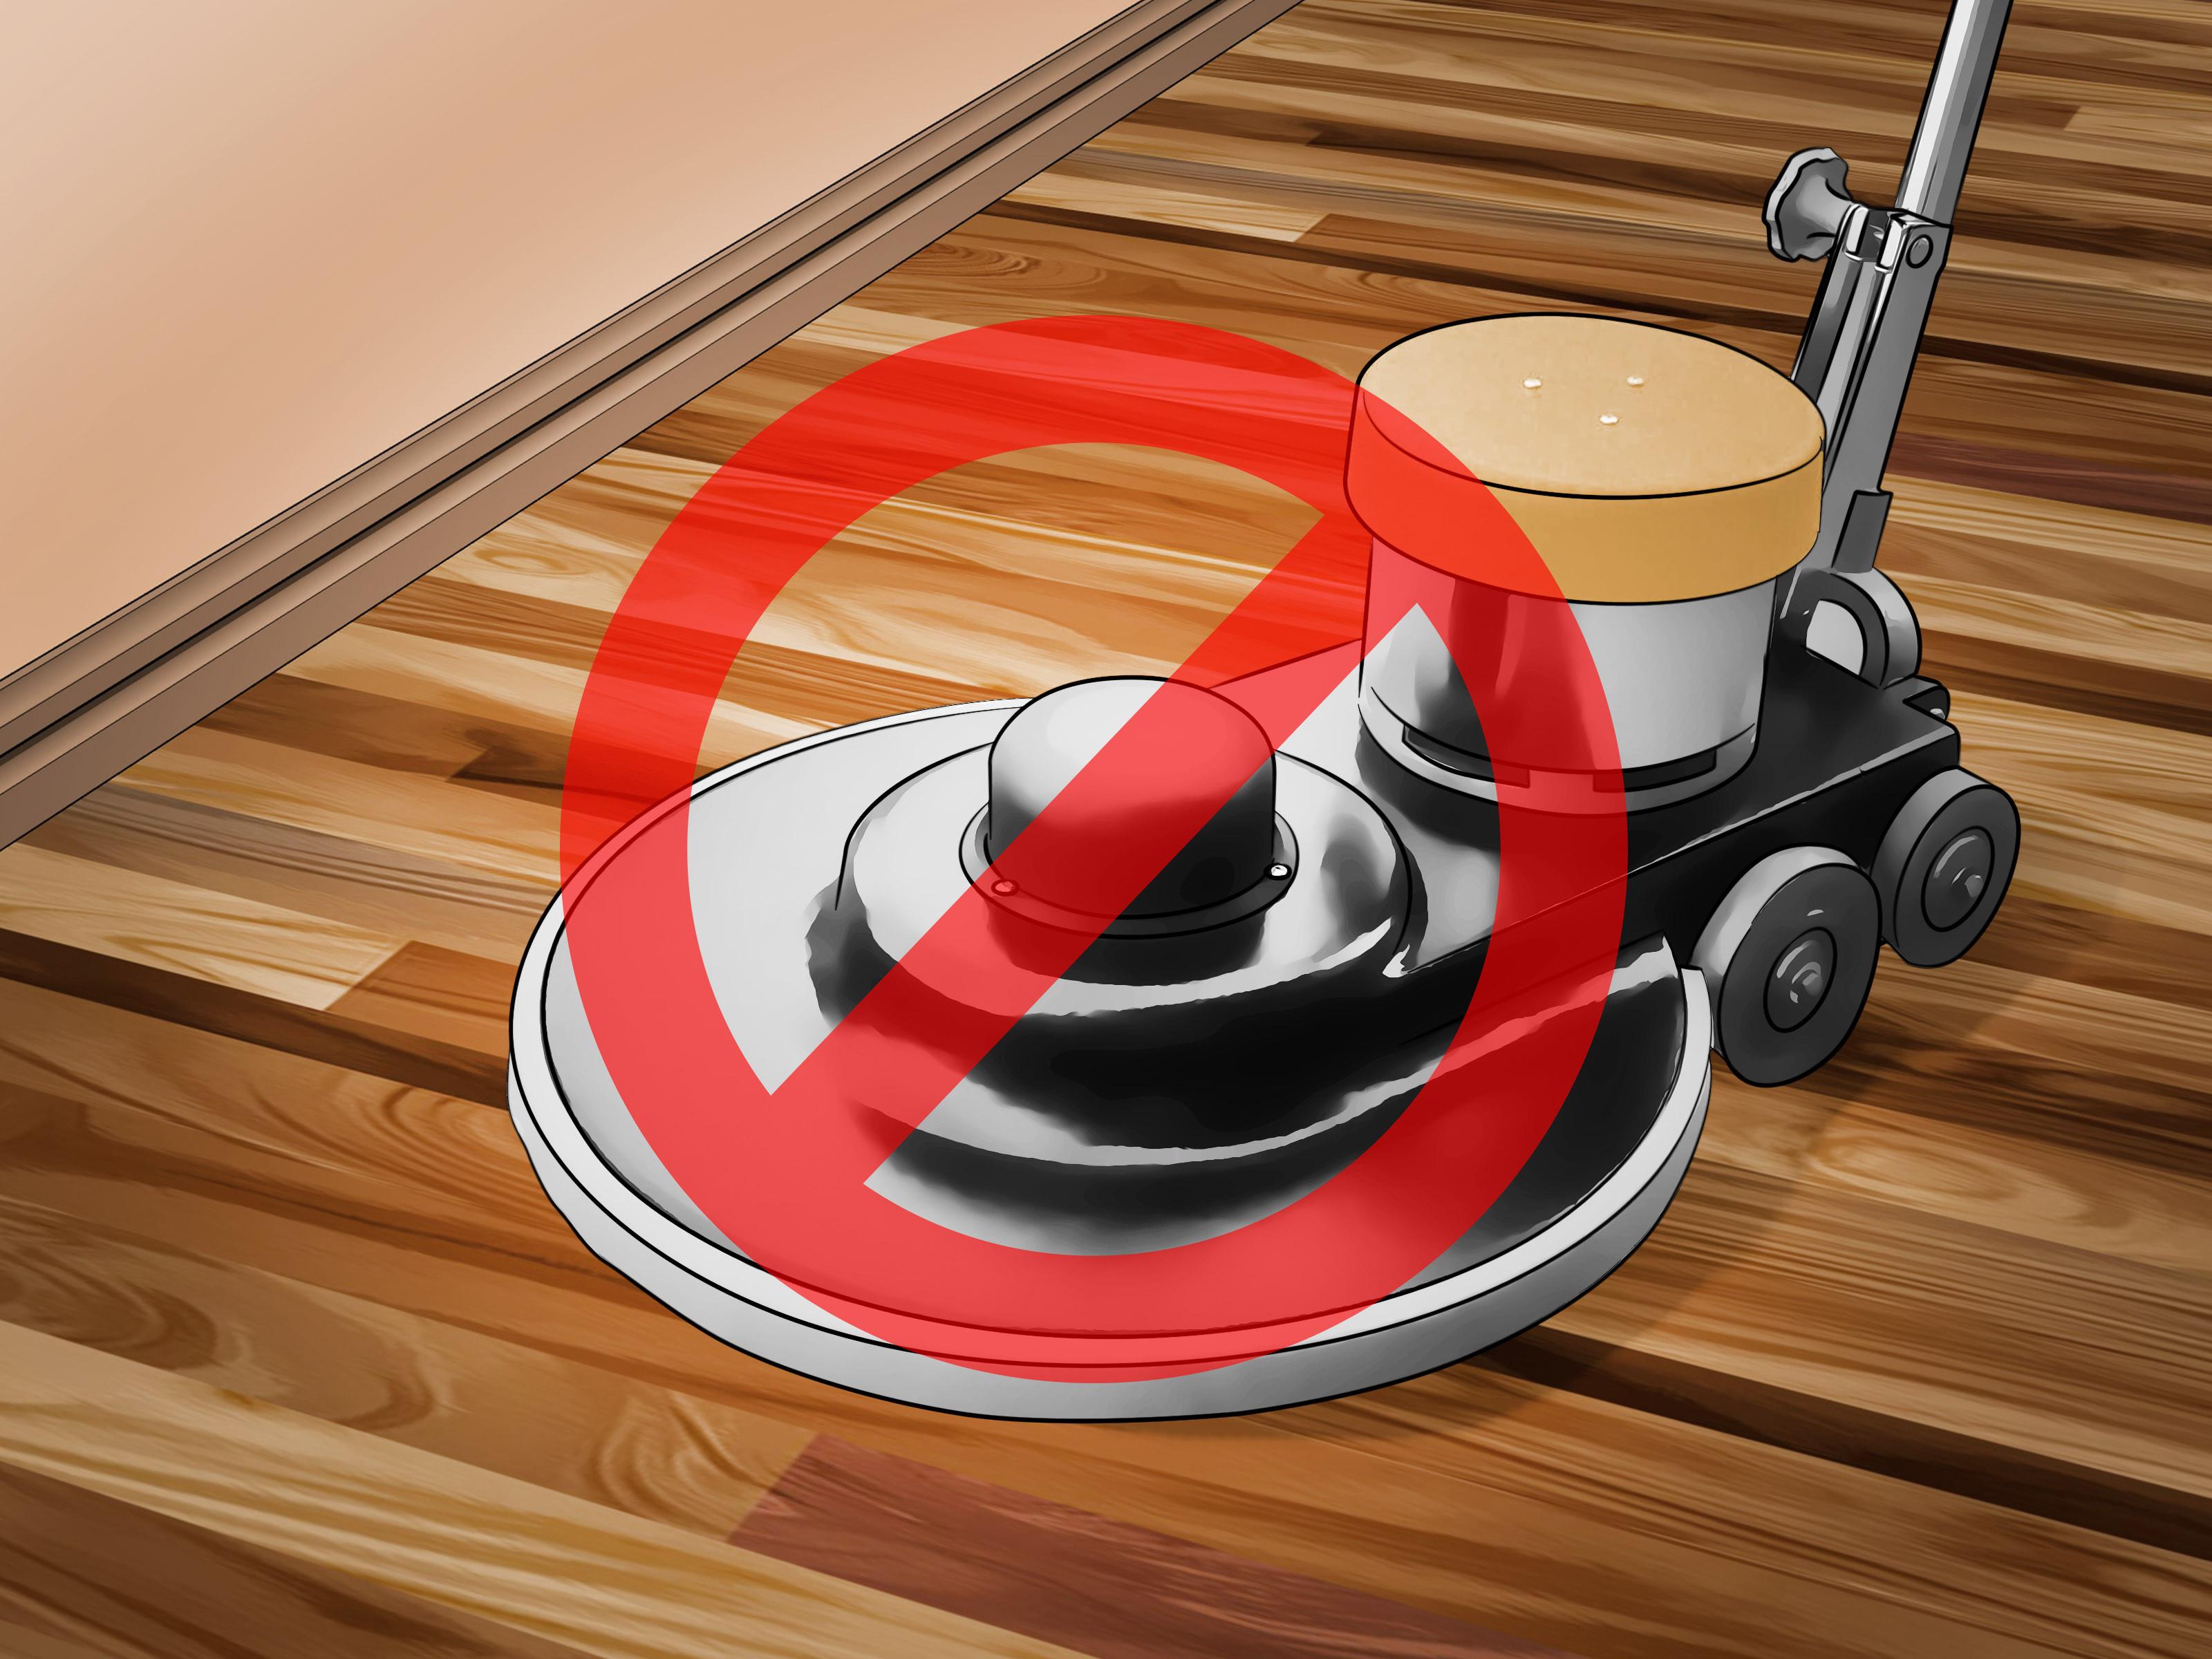 Vacuum Cleaner for Hardwood Floors Reviews Of 4 Ways to Clean Polyurethane Wood Floors Wikihow Inside Clean Polyurethane Wood Floors Step 15